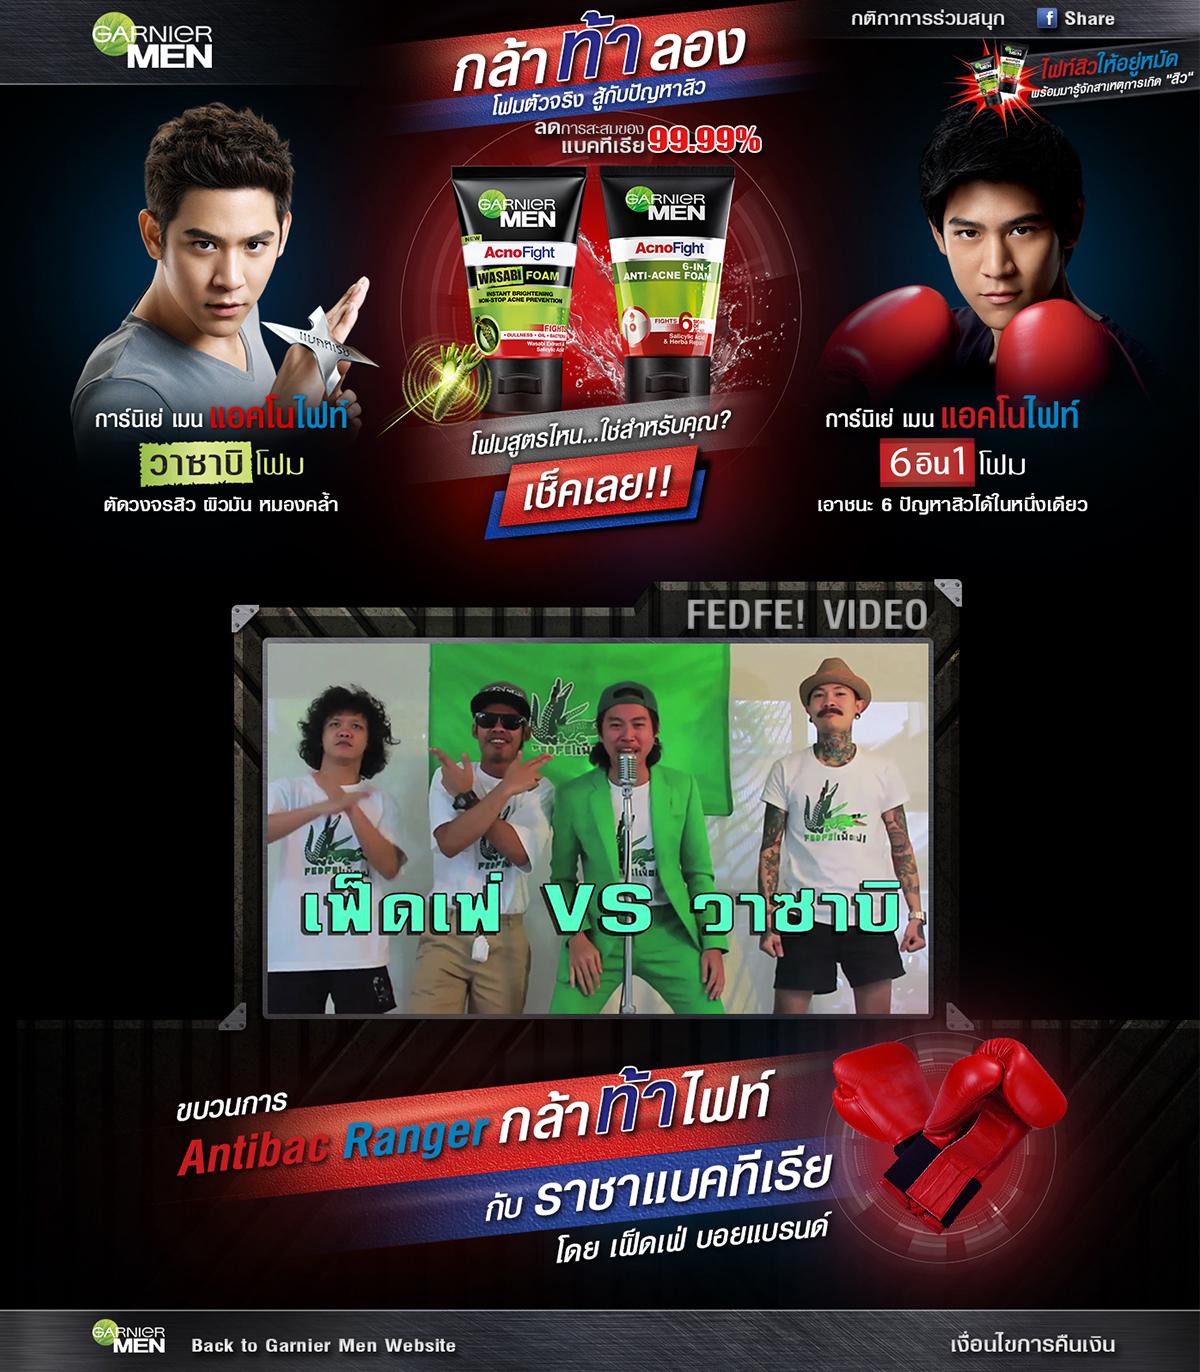 24-Campaigngarnier-mea-acno-fight-wasabi-04